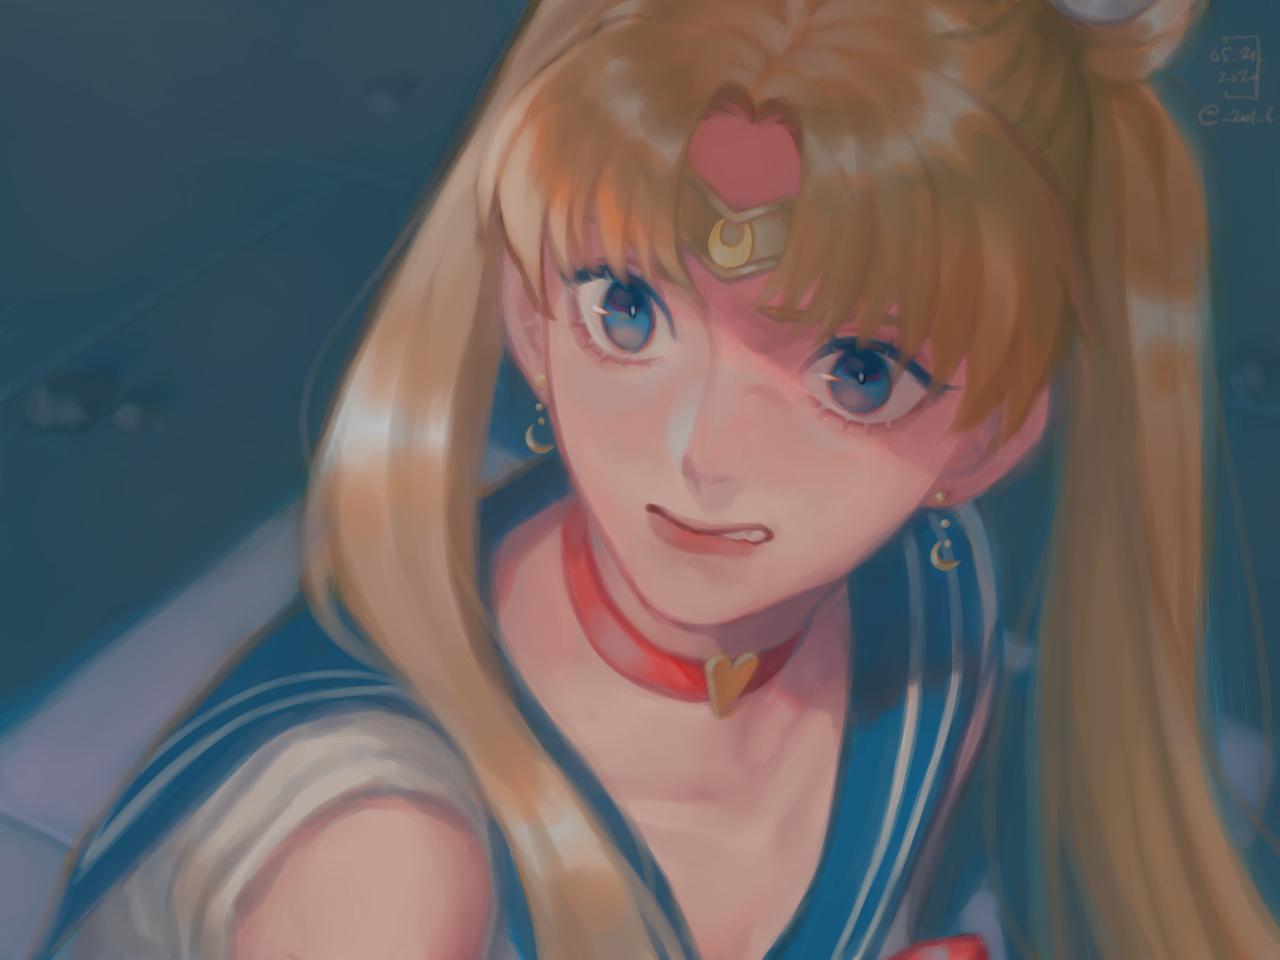 Sailor Moon Redraw Illust of Akn blue illustration painting UsagiTsukino medibang sailormoonredraw PrettyGuardianSailorMoon